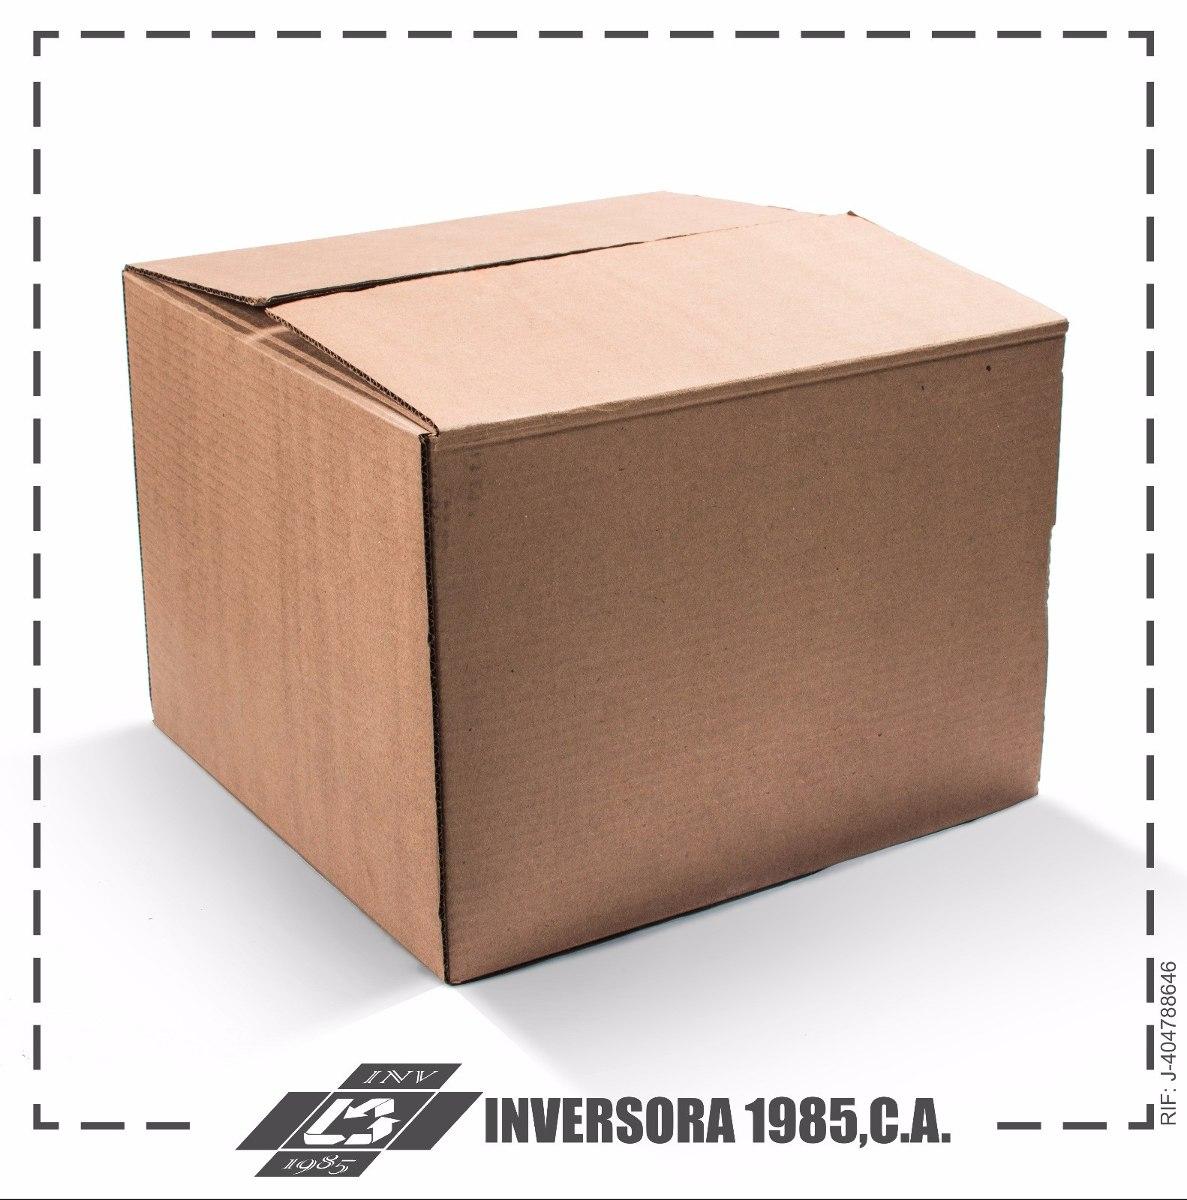 Cajas cart n fabrica empaque embalaje industria valencia for Cajas carton embalaje